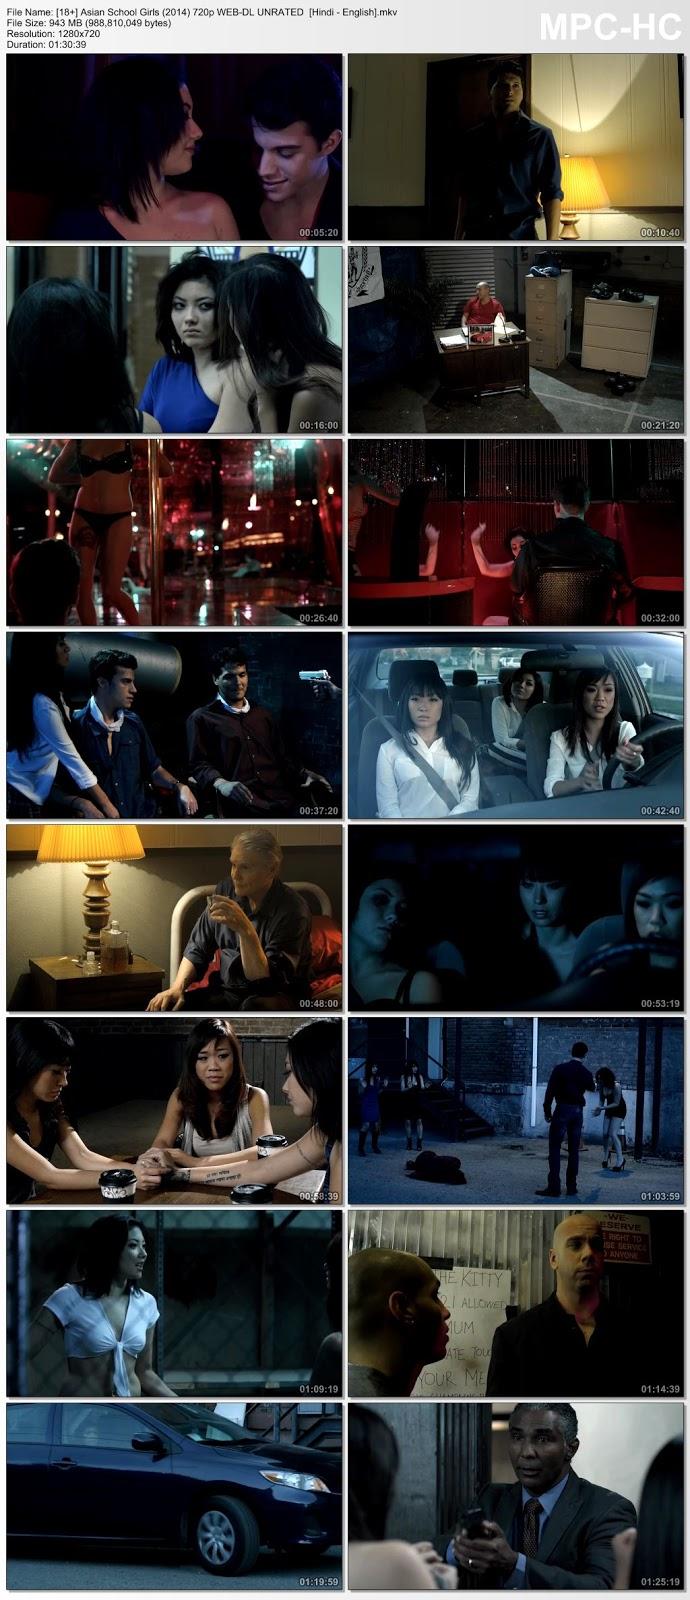 [18+] Asian School Girls (2014) 480p WEB-DL UNRATED Dual Audio [Hindi – English] 300MB Desirehub